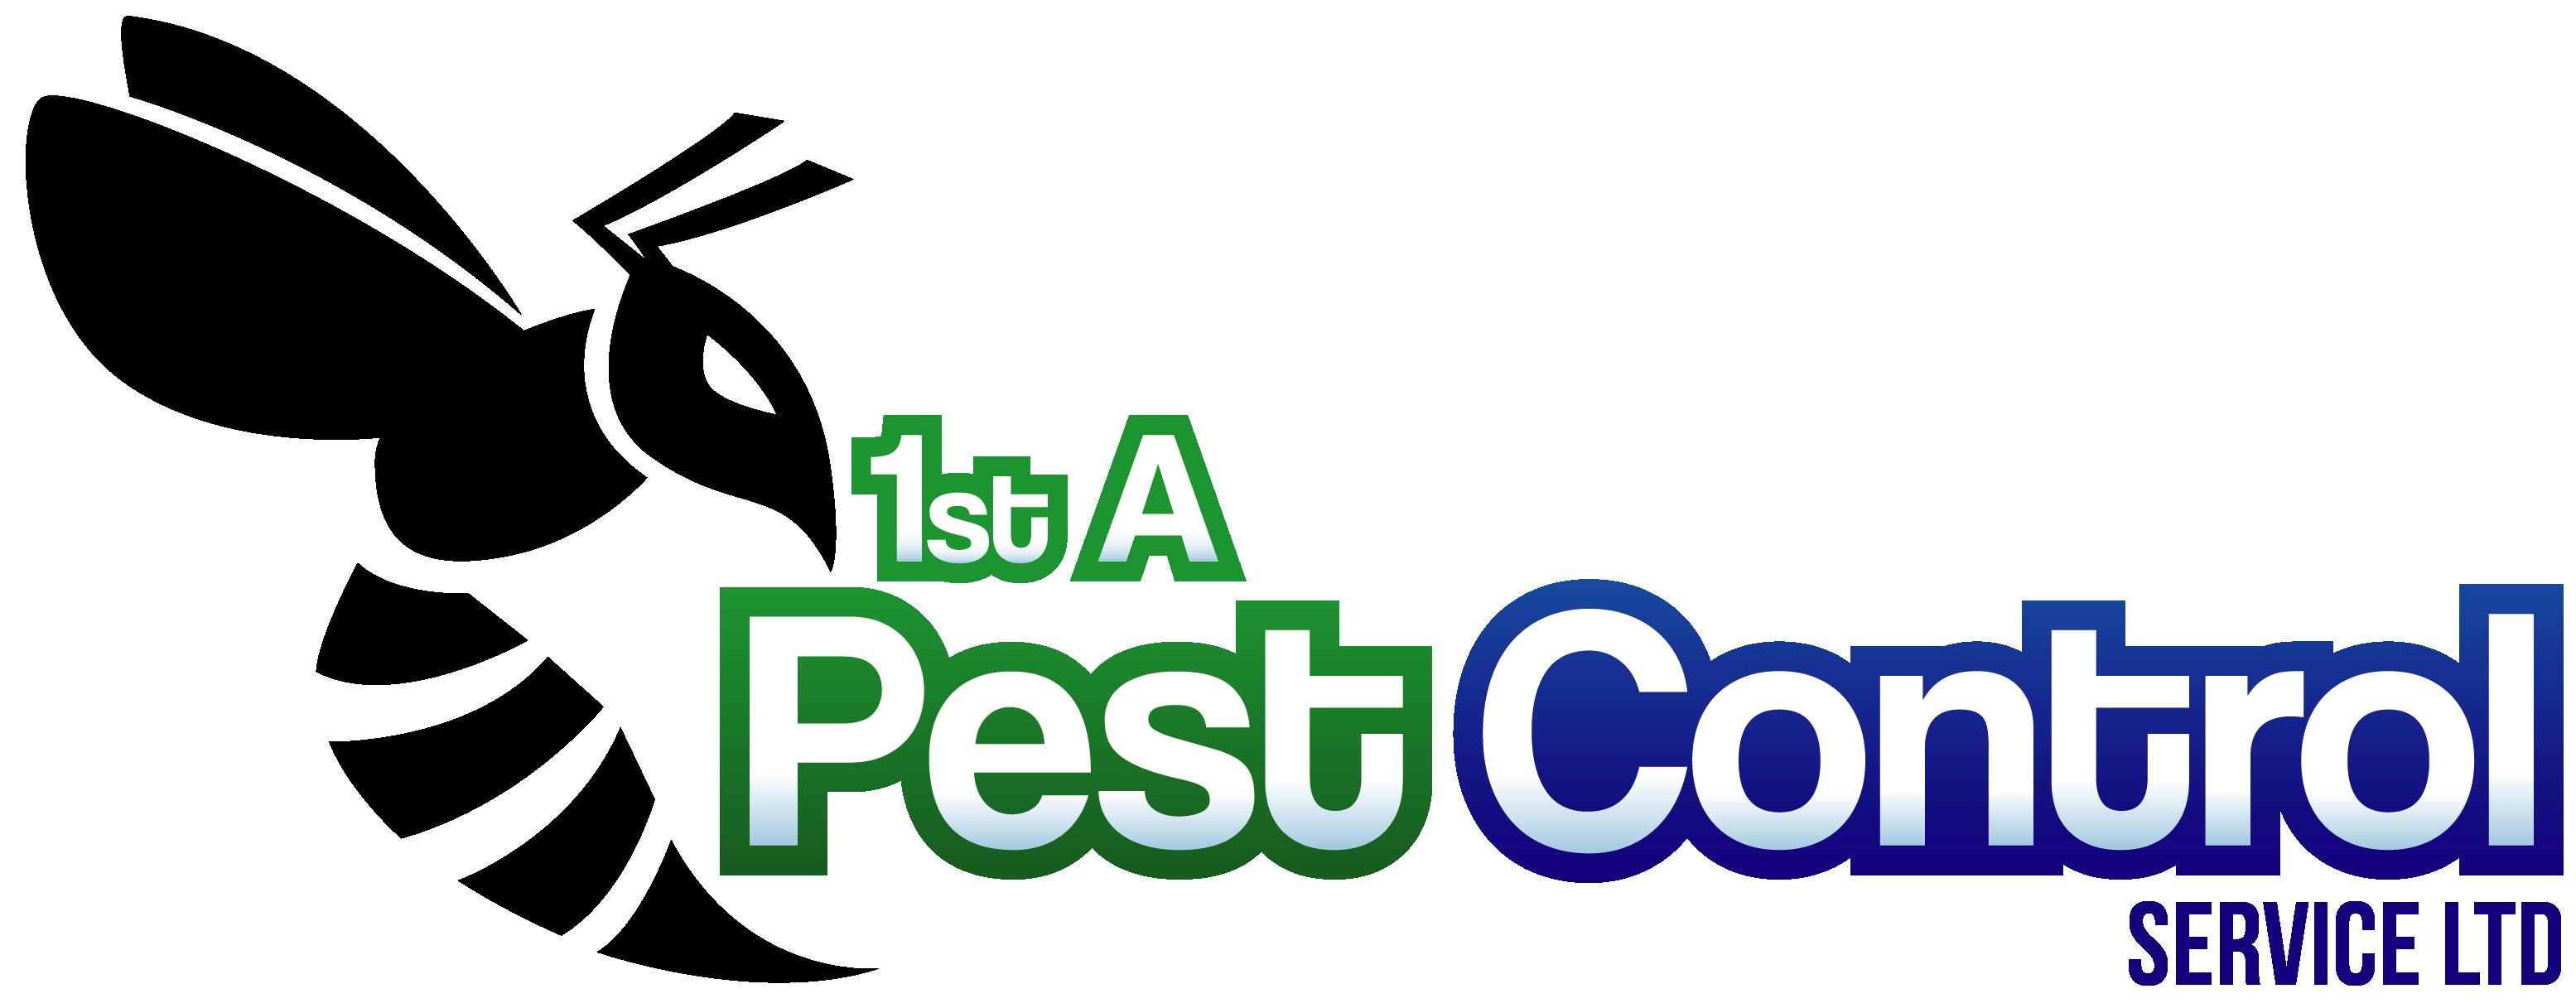 1st A Pest Control Service LTD